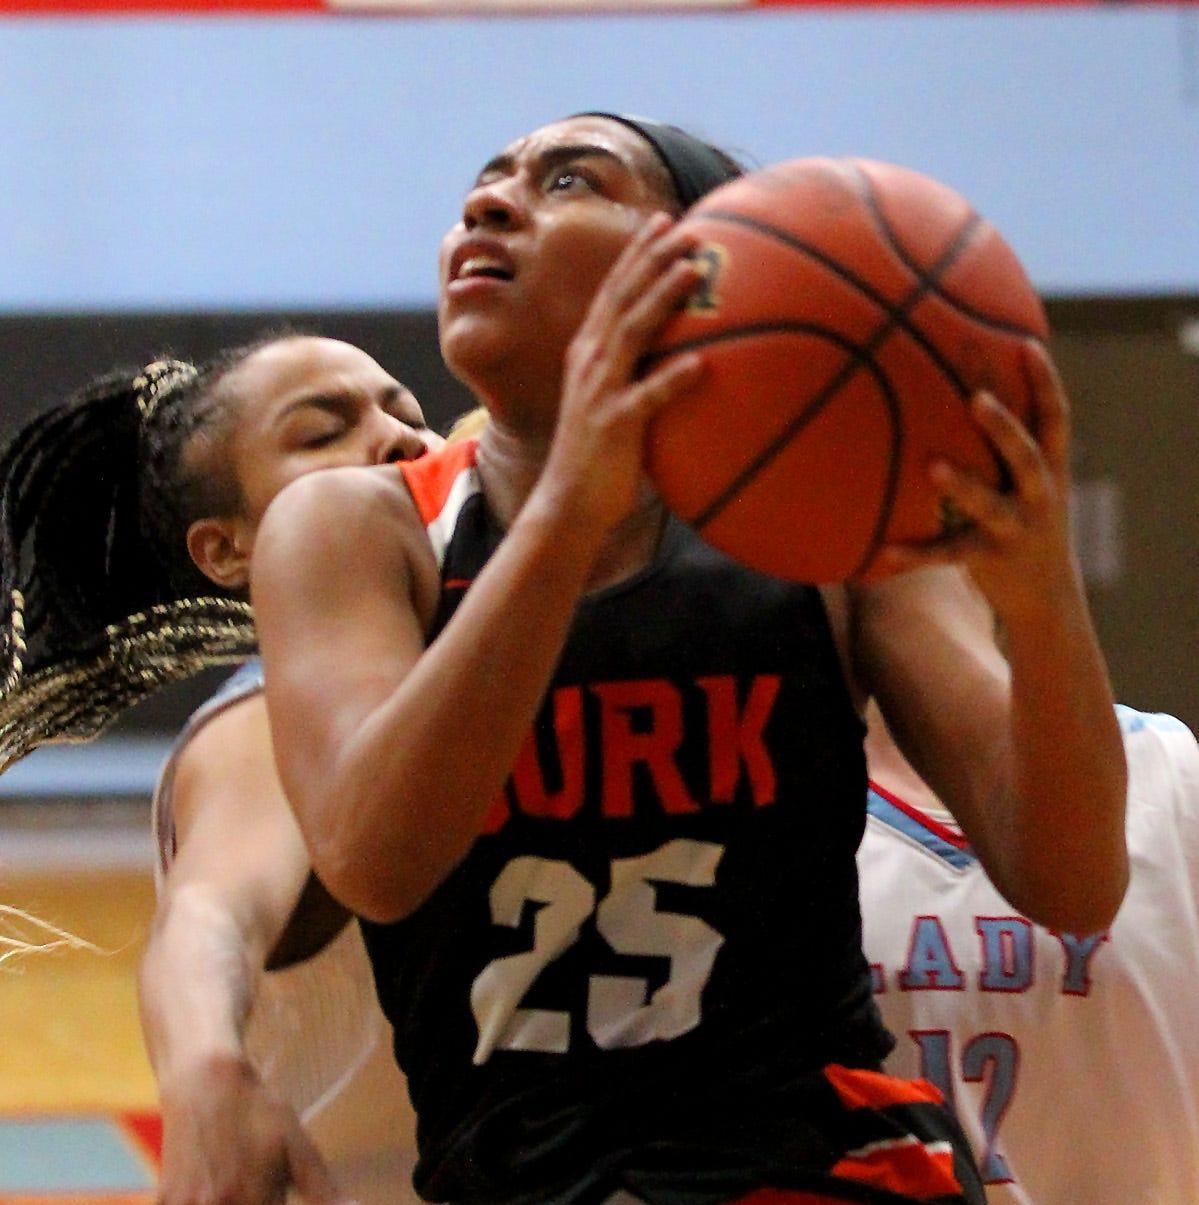 Girls basketball leaders (through Jan. 19)